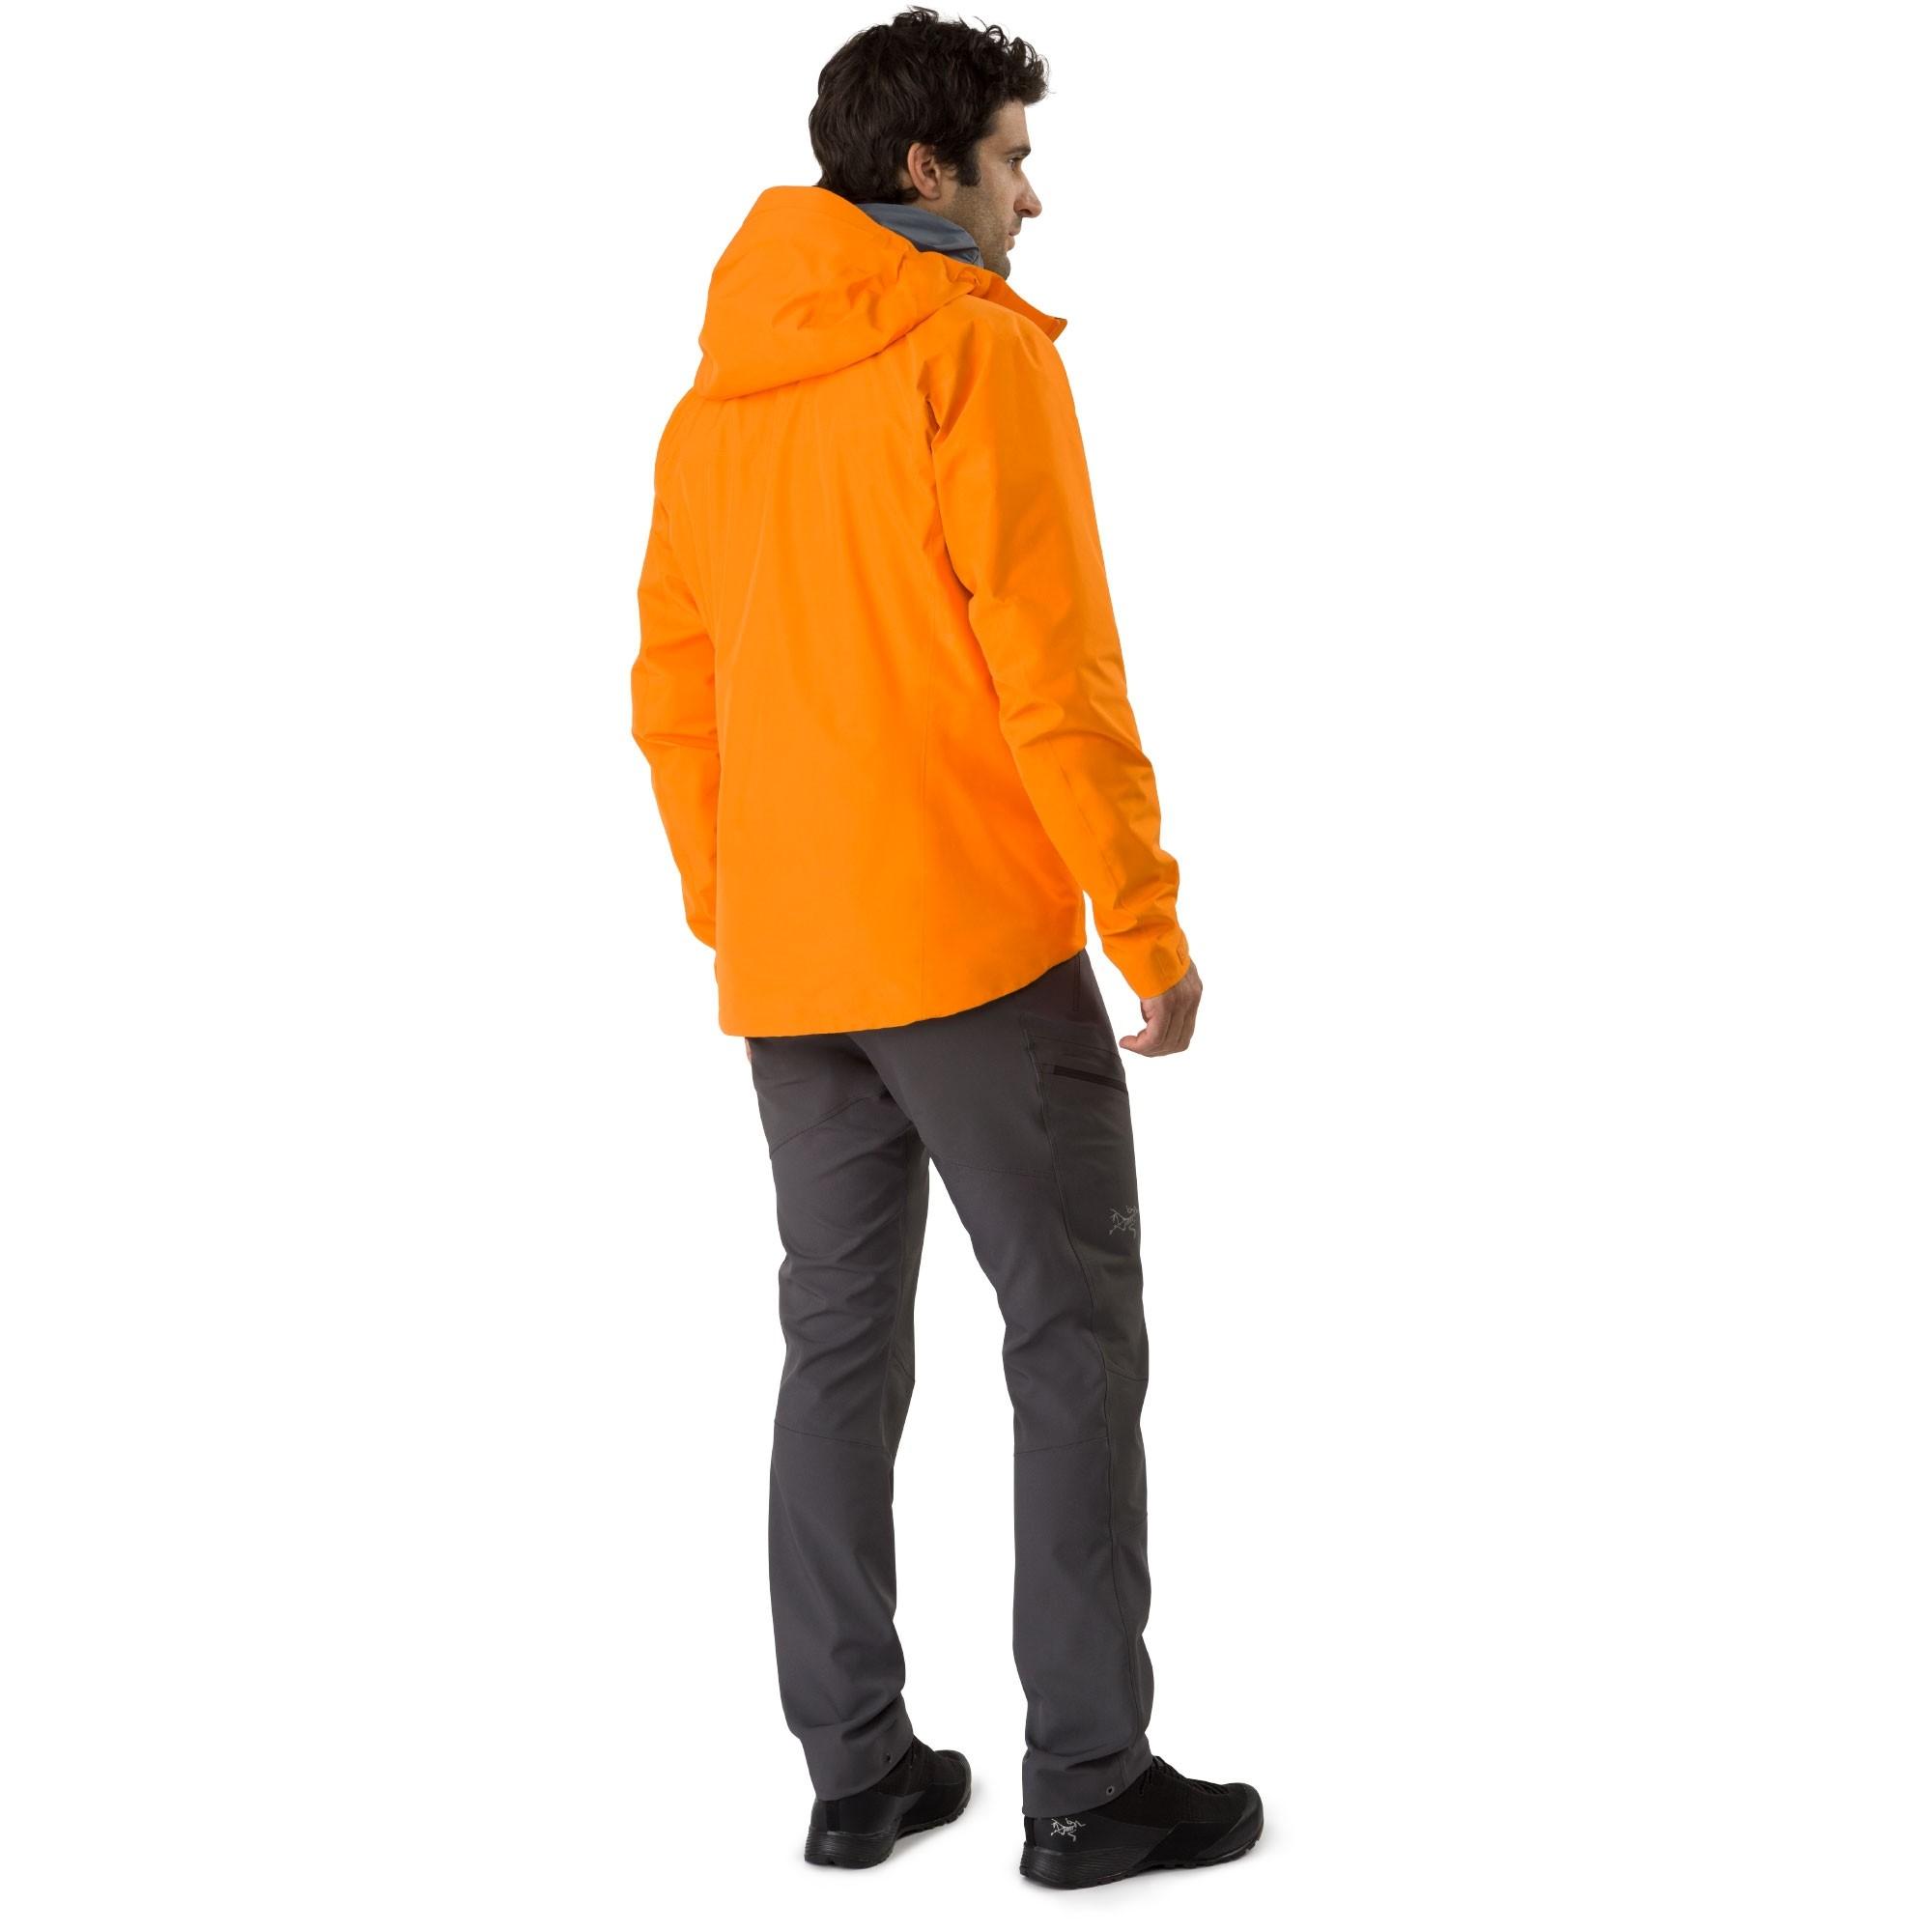 Arc'teryx Alpha FL Waterproof Jacket - Beacon